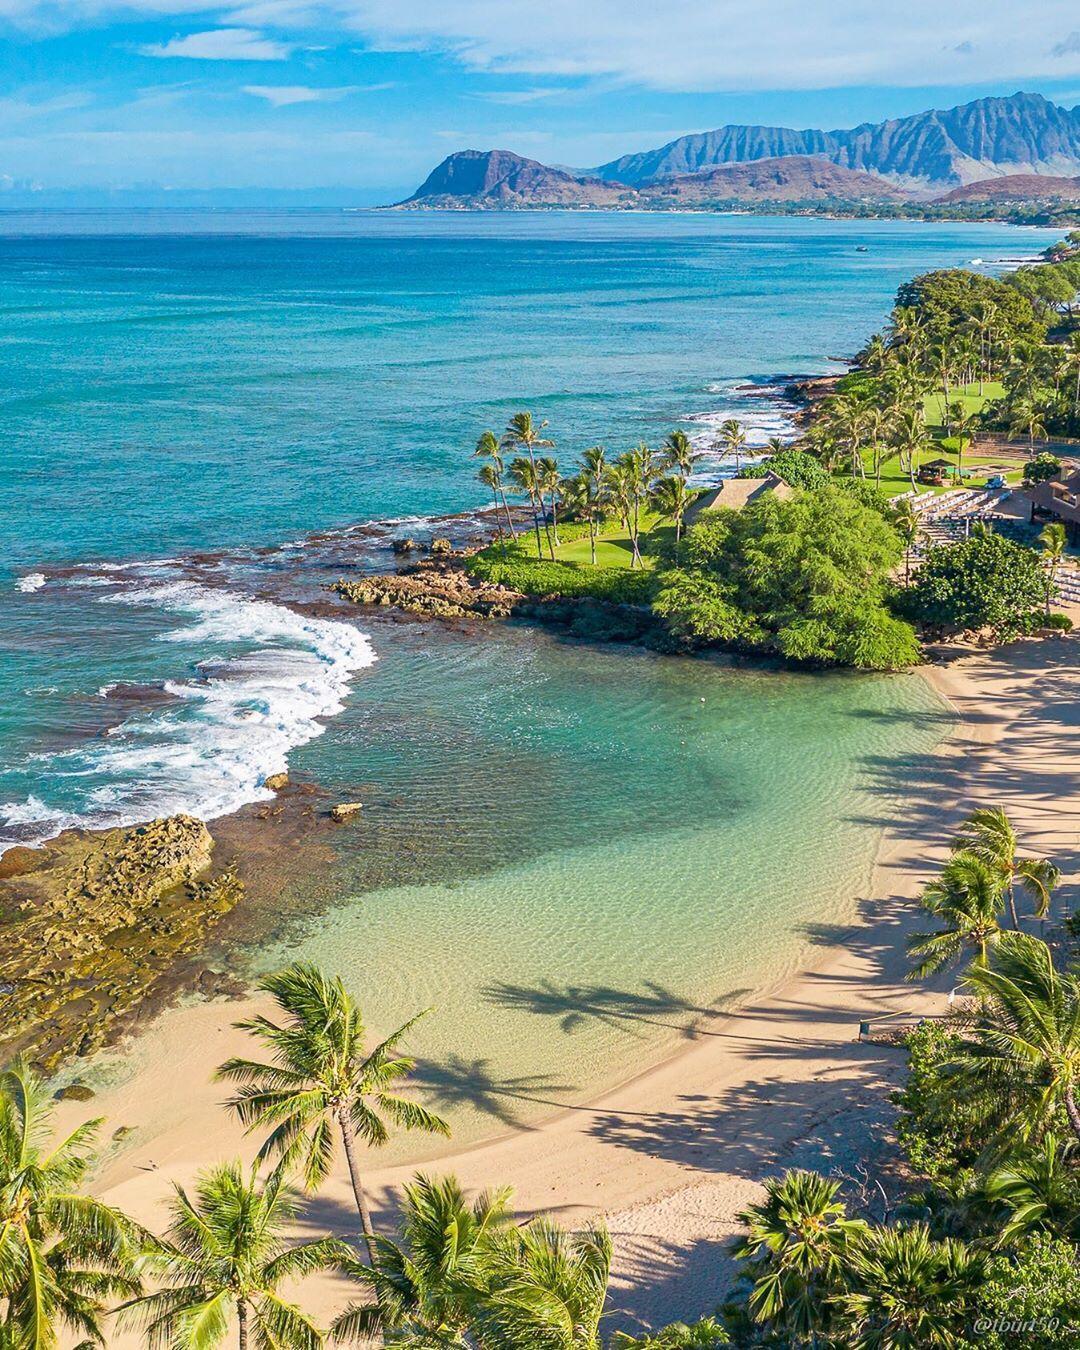 Mahalo Tburt50 Beautiful Photography In Oahu Hawaii Monday Blues From West Oahu Hawaii Luau Co Hawaii Travel West Oahu Hawaii Photography